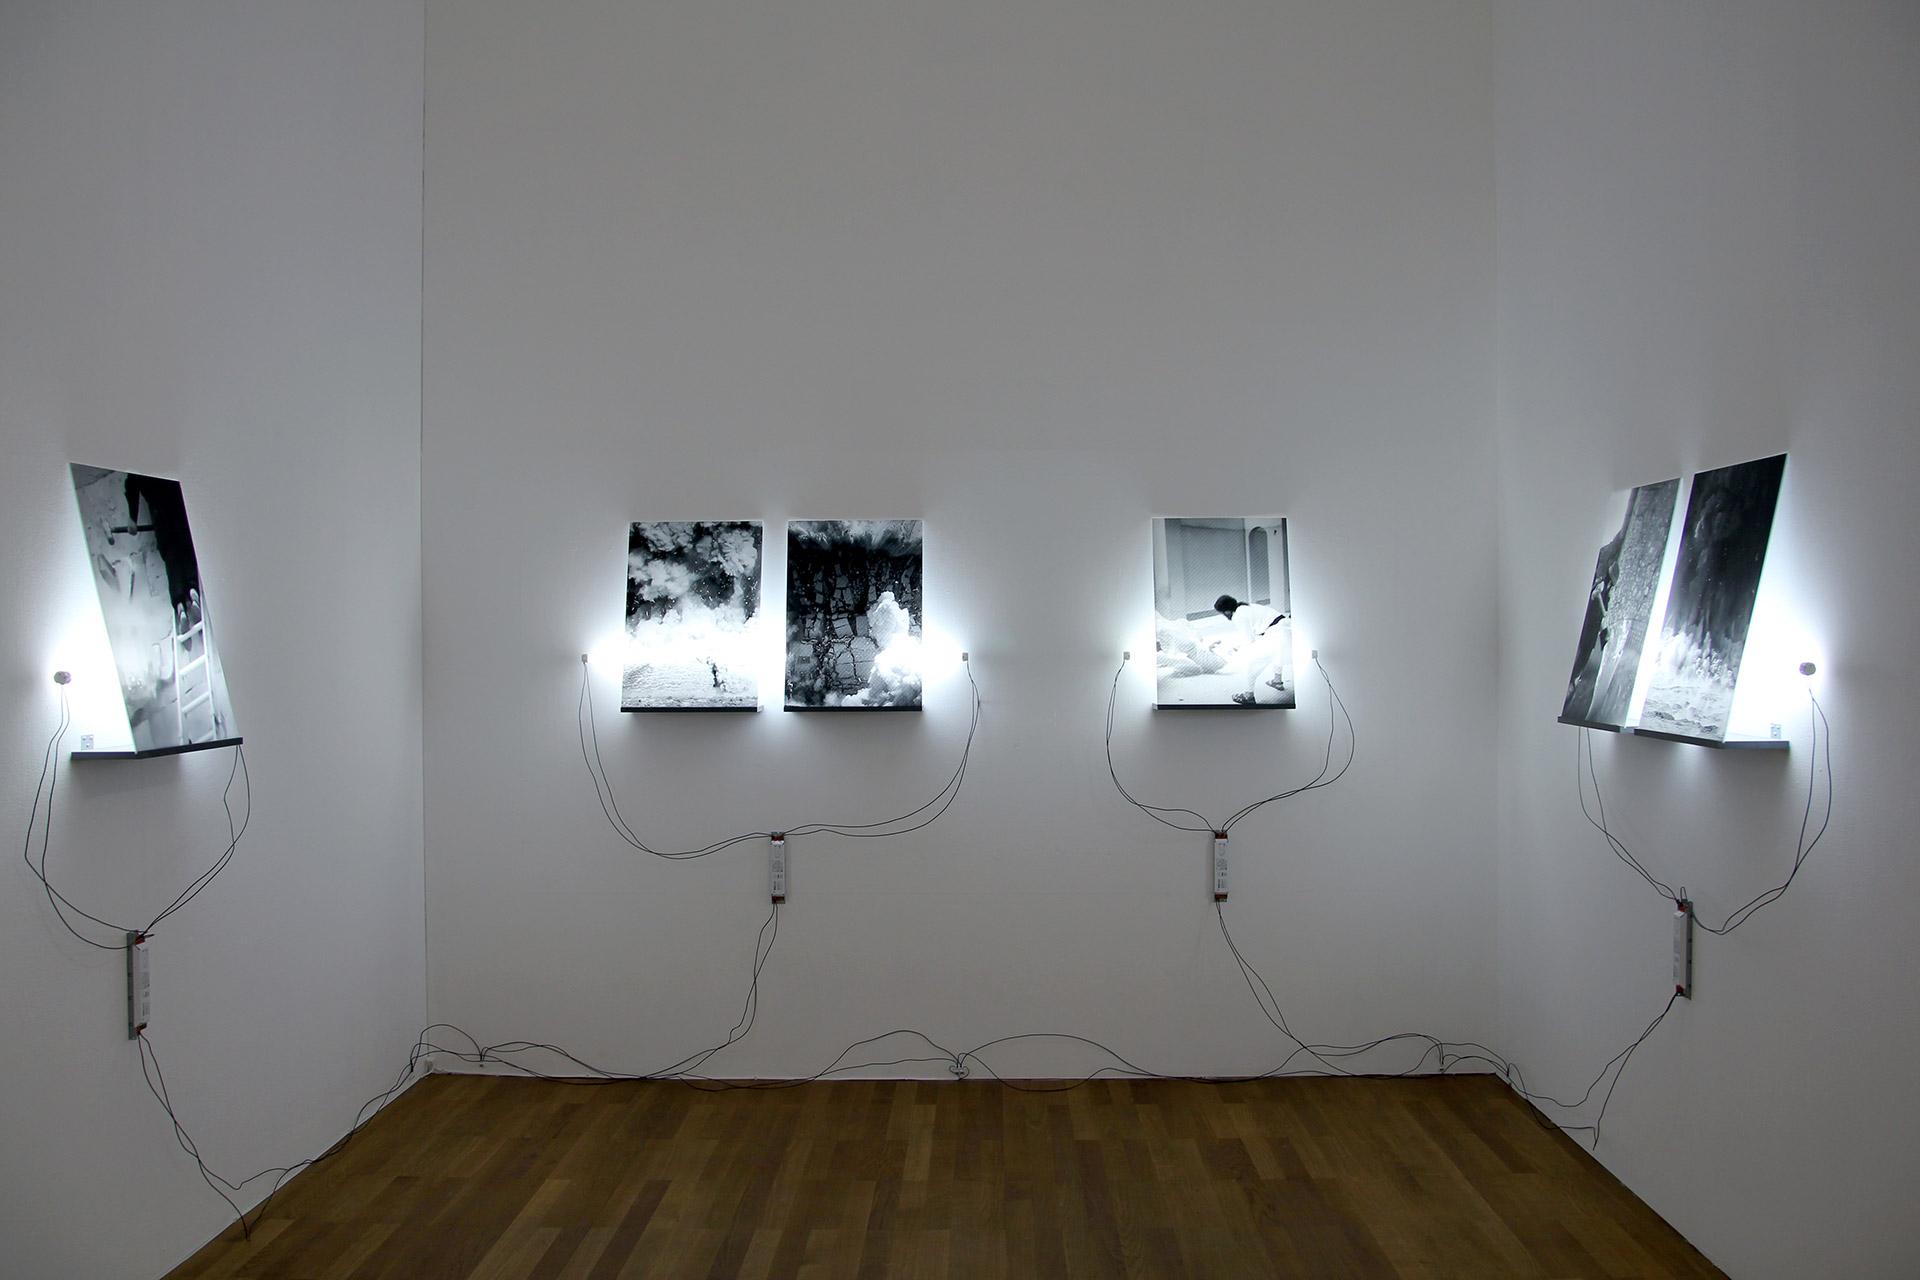 Dezember-Ausstellung-Kunsthalle-Winterthur-2015.jpg